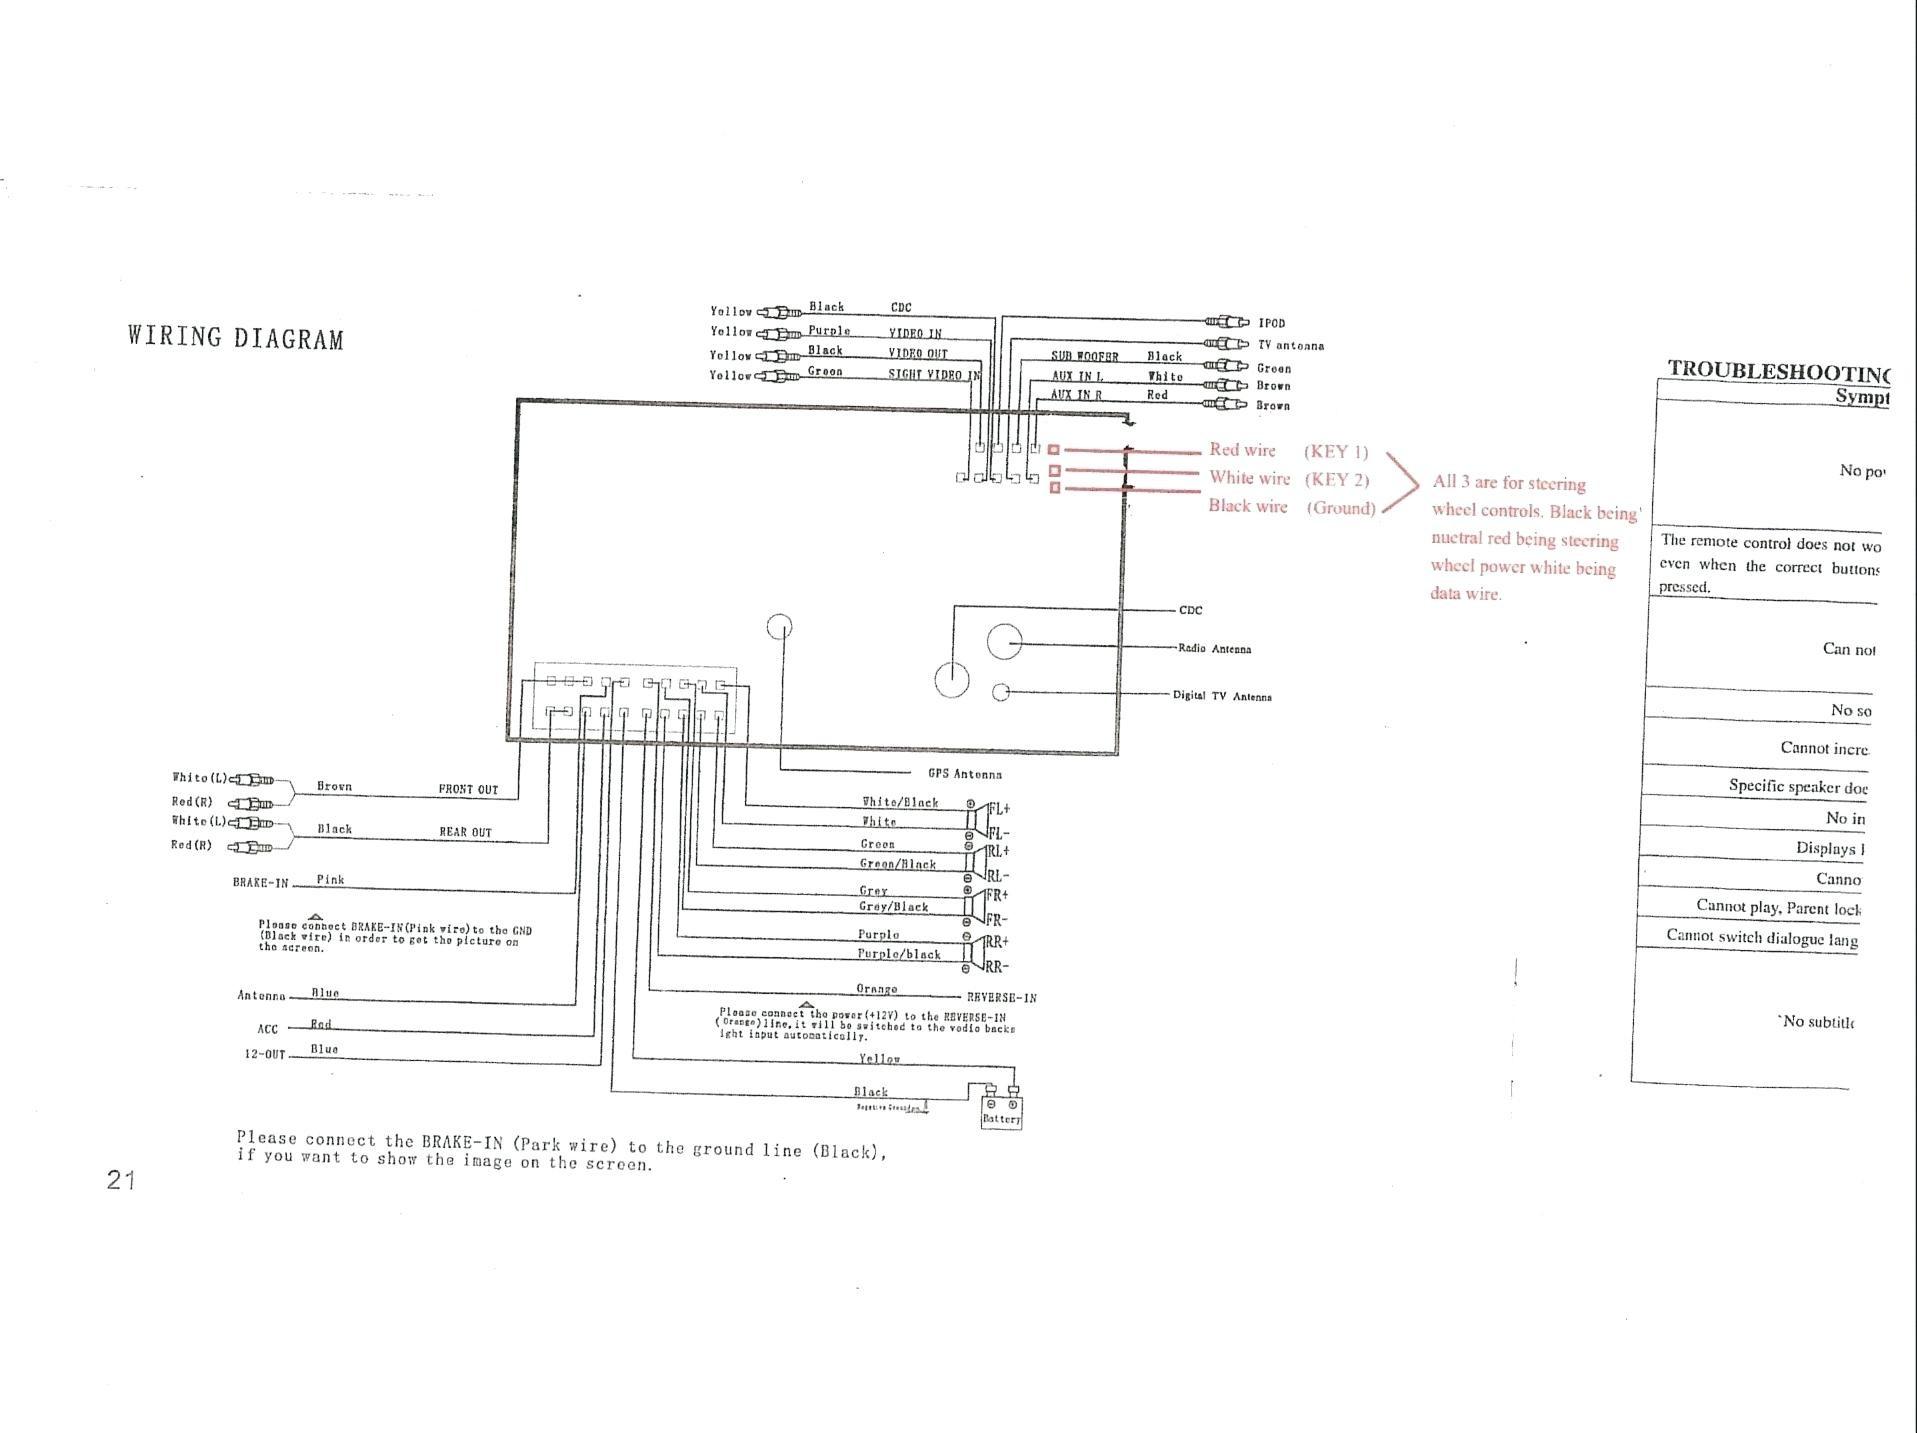 hight resolution of gmos 04 wiring diagram blog wiring diagram jvc car stereo wiring harness diagram gmos 04 wiring